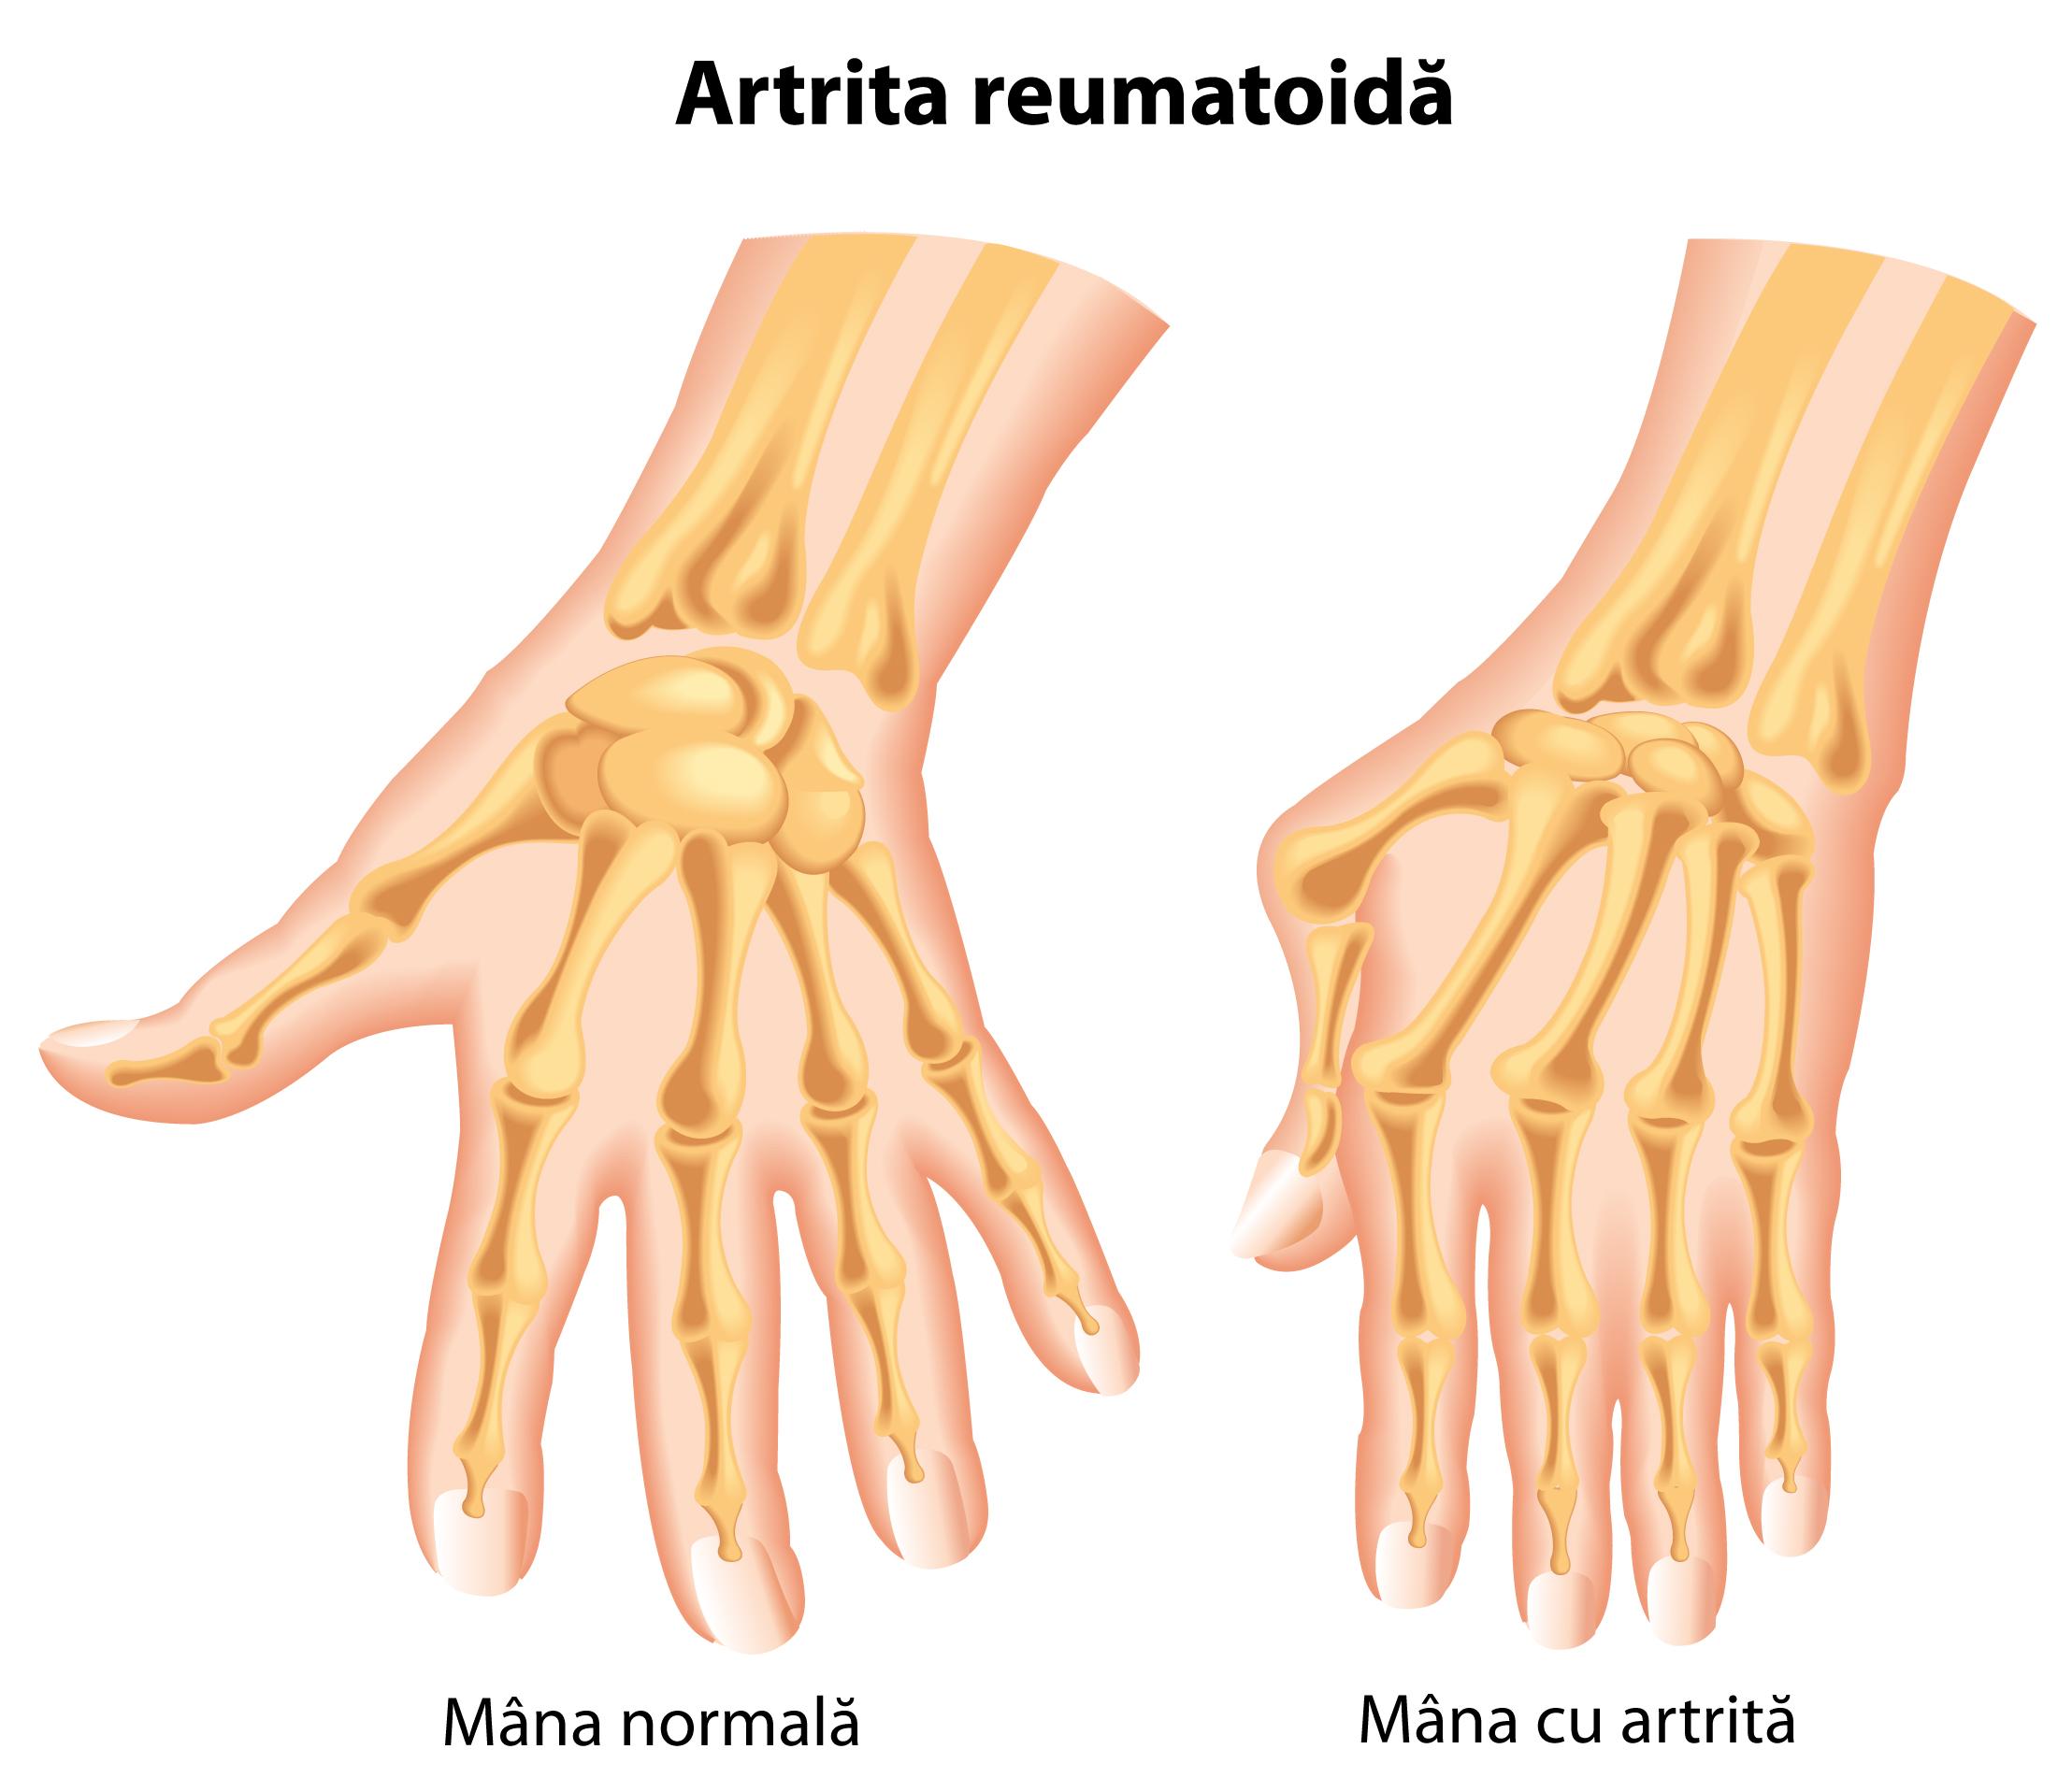 Artrita reumatoida: 5 tipuri de exercitii pentru maini